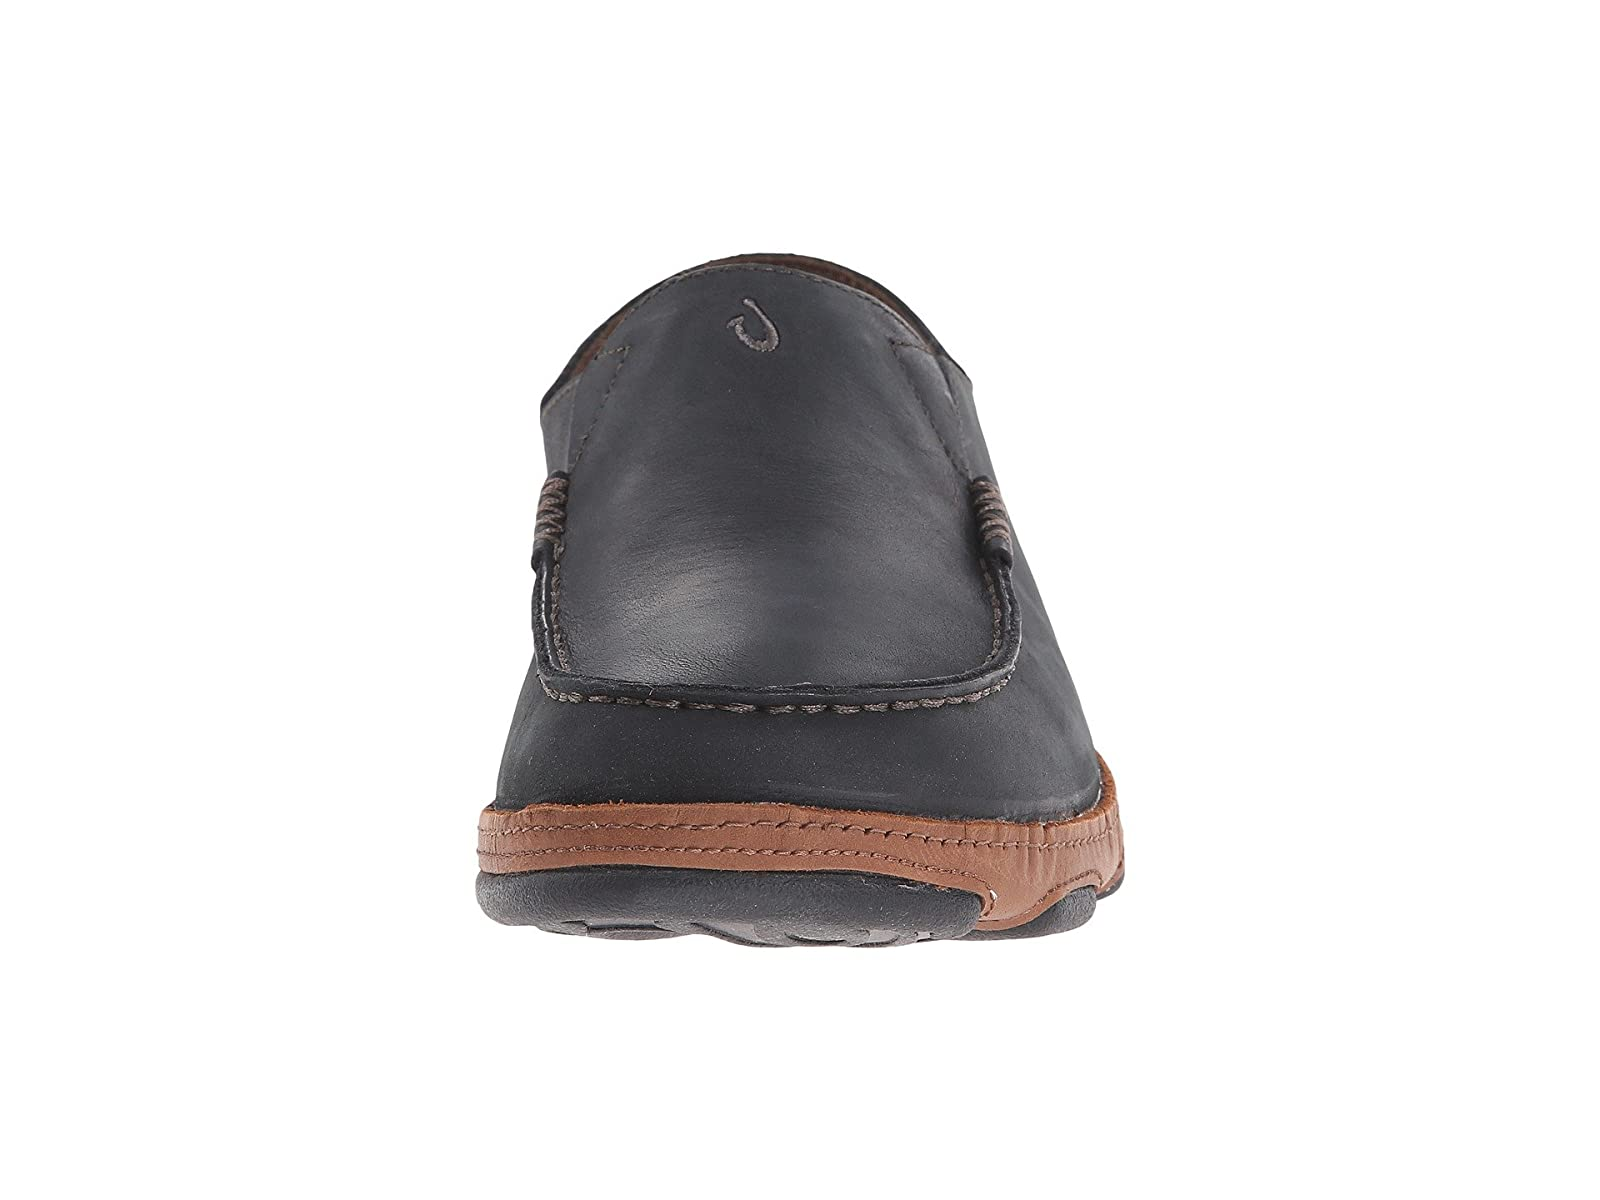 Gentleman/Lady Men's/Women's OluKai Moloa High Quality and Cheap Online Online Online Shop 26a93e